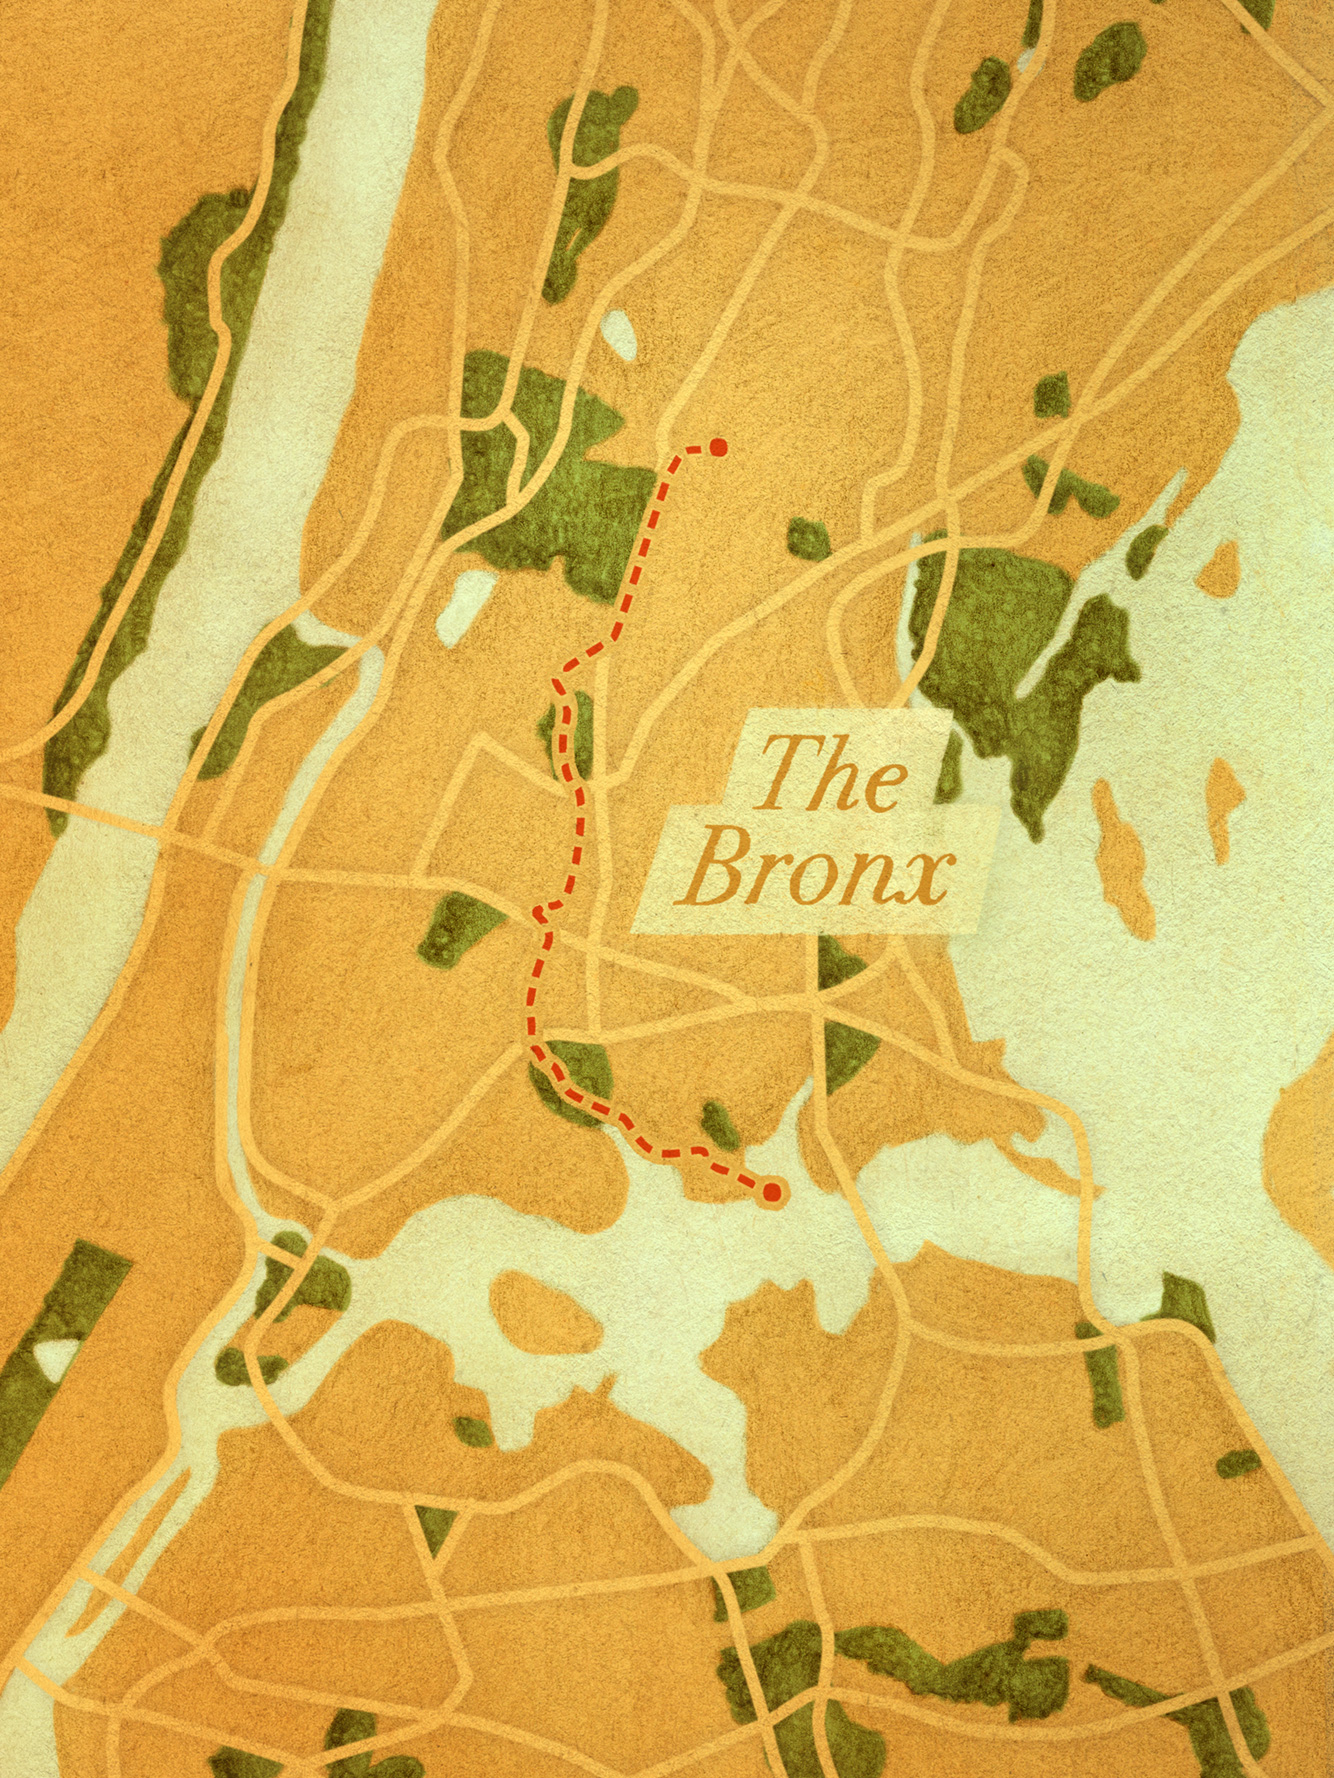 Bronx River Greenway (The Bronx)